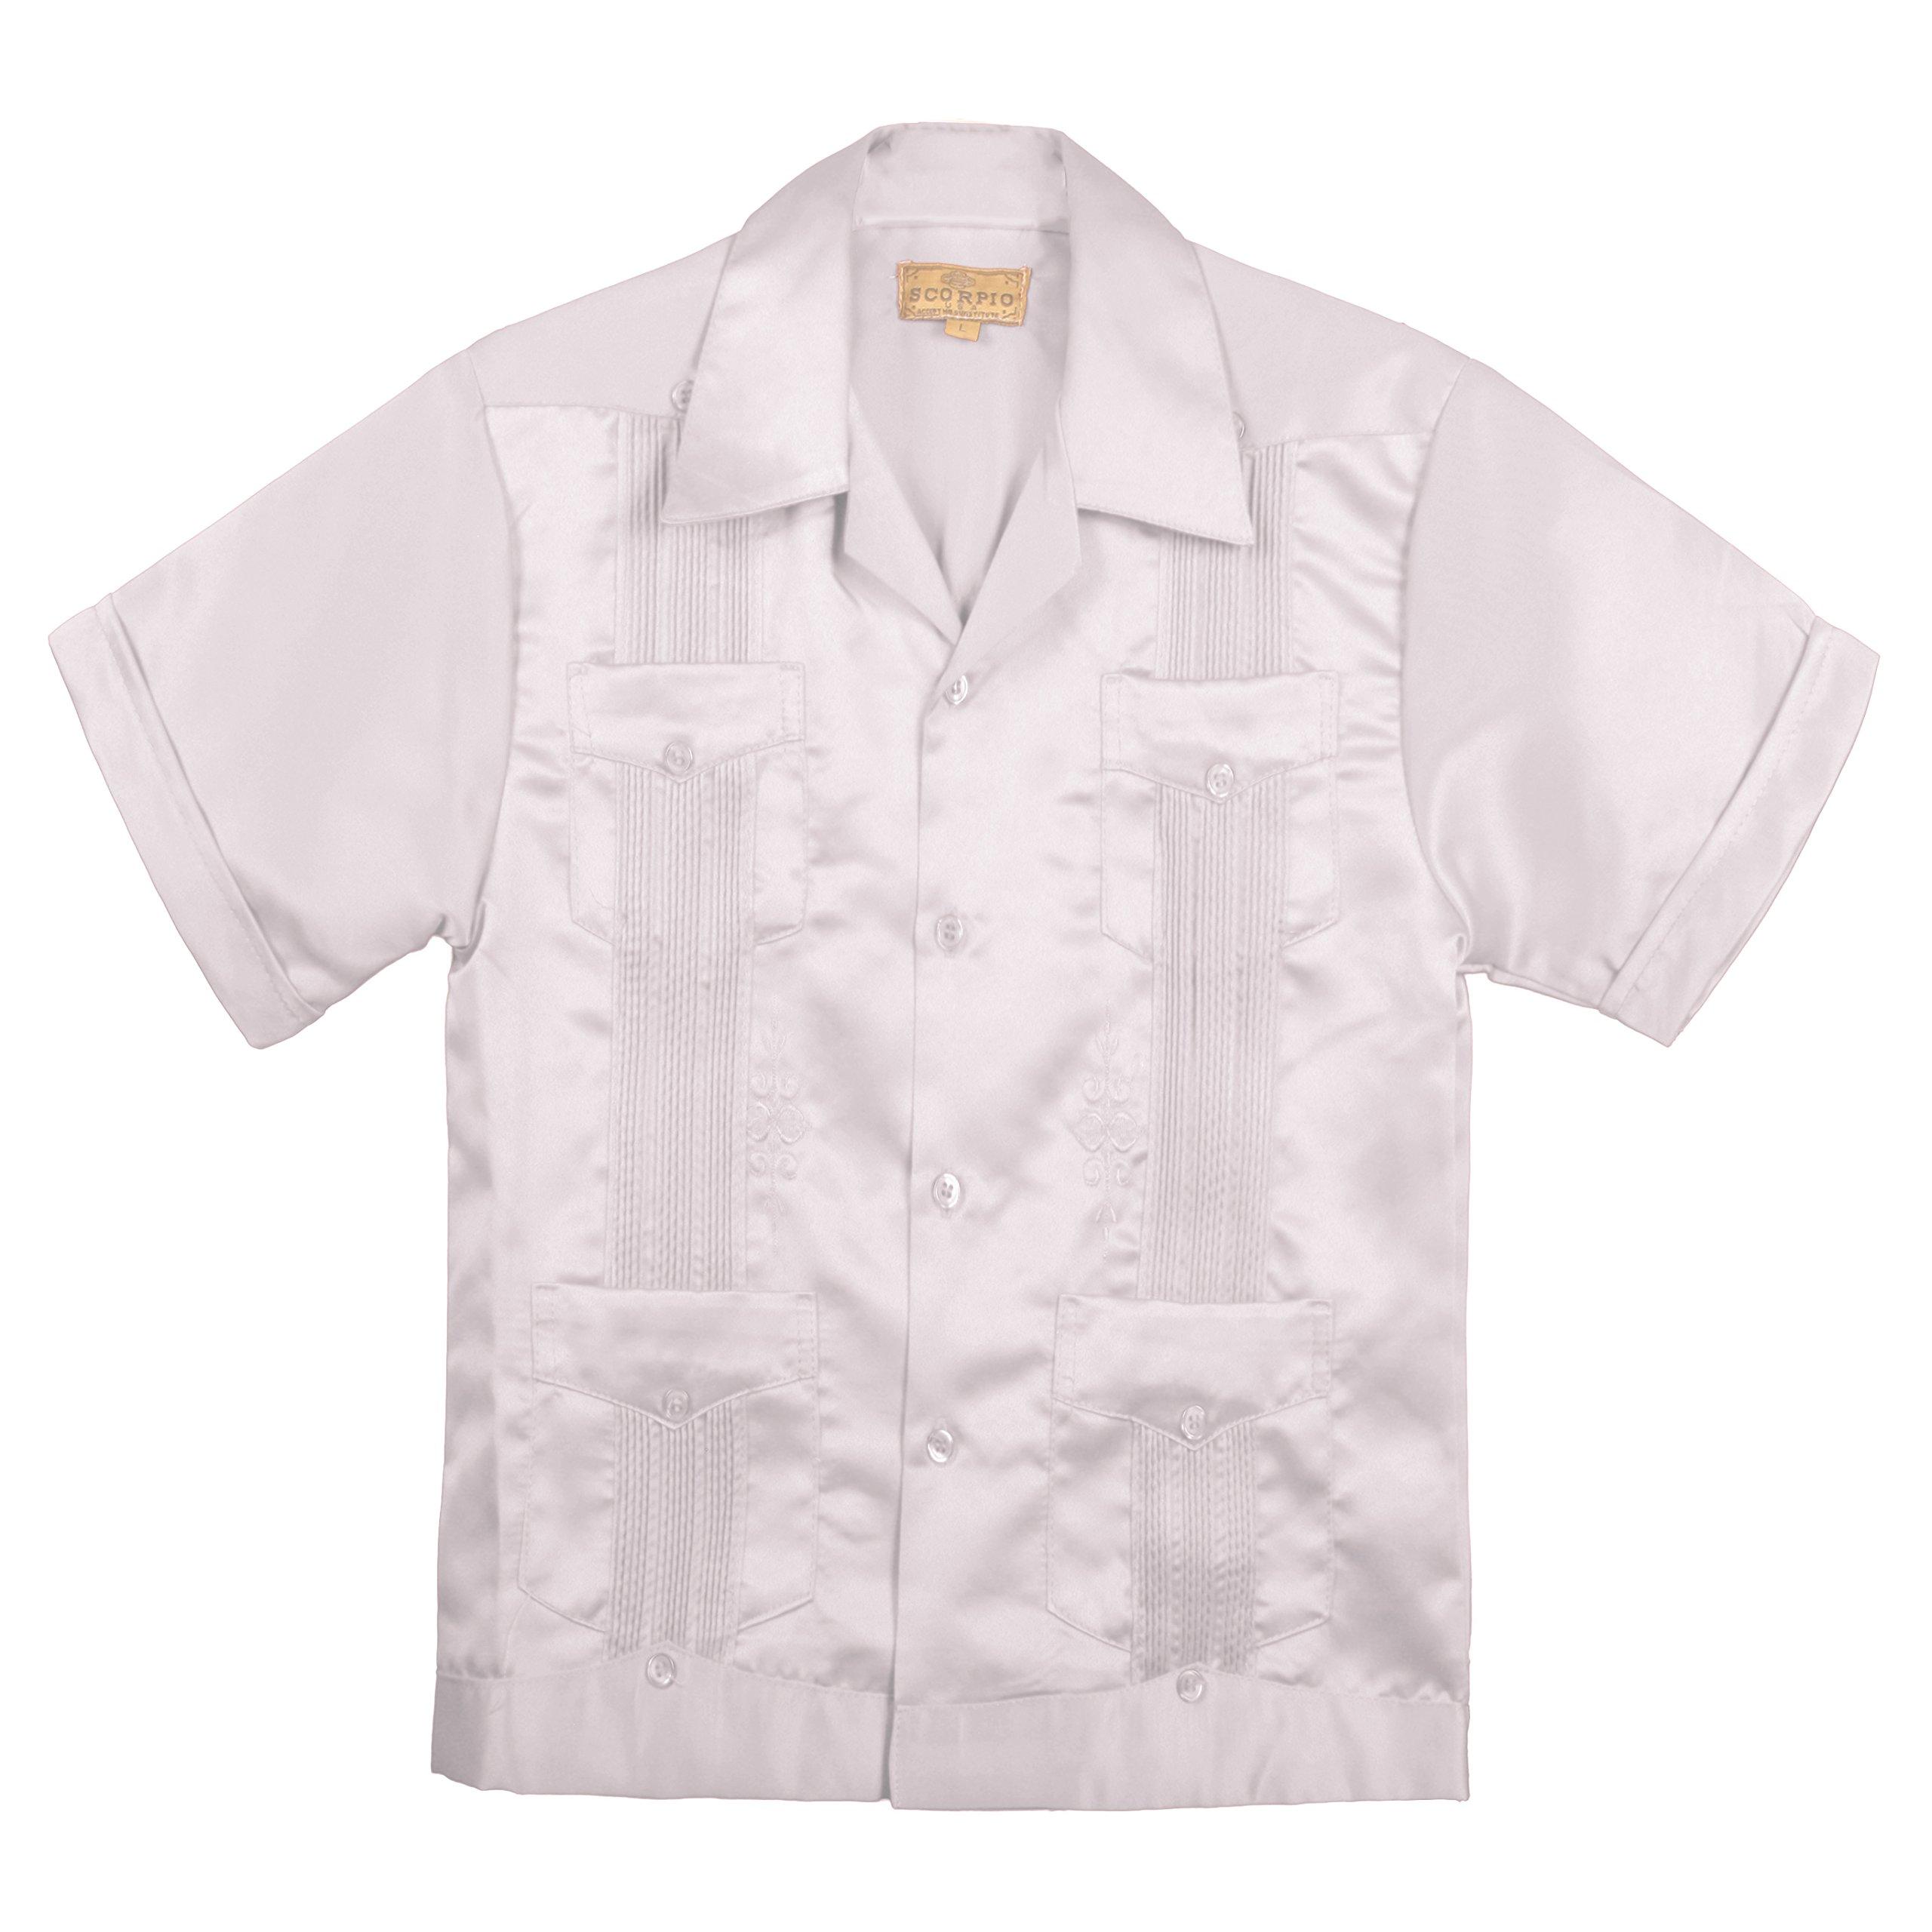 Kids Boys' Guayabera Satin Short Sleeve Shirt WHITE